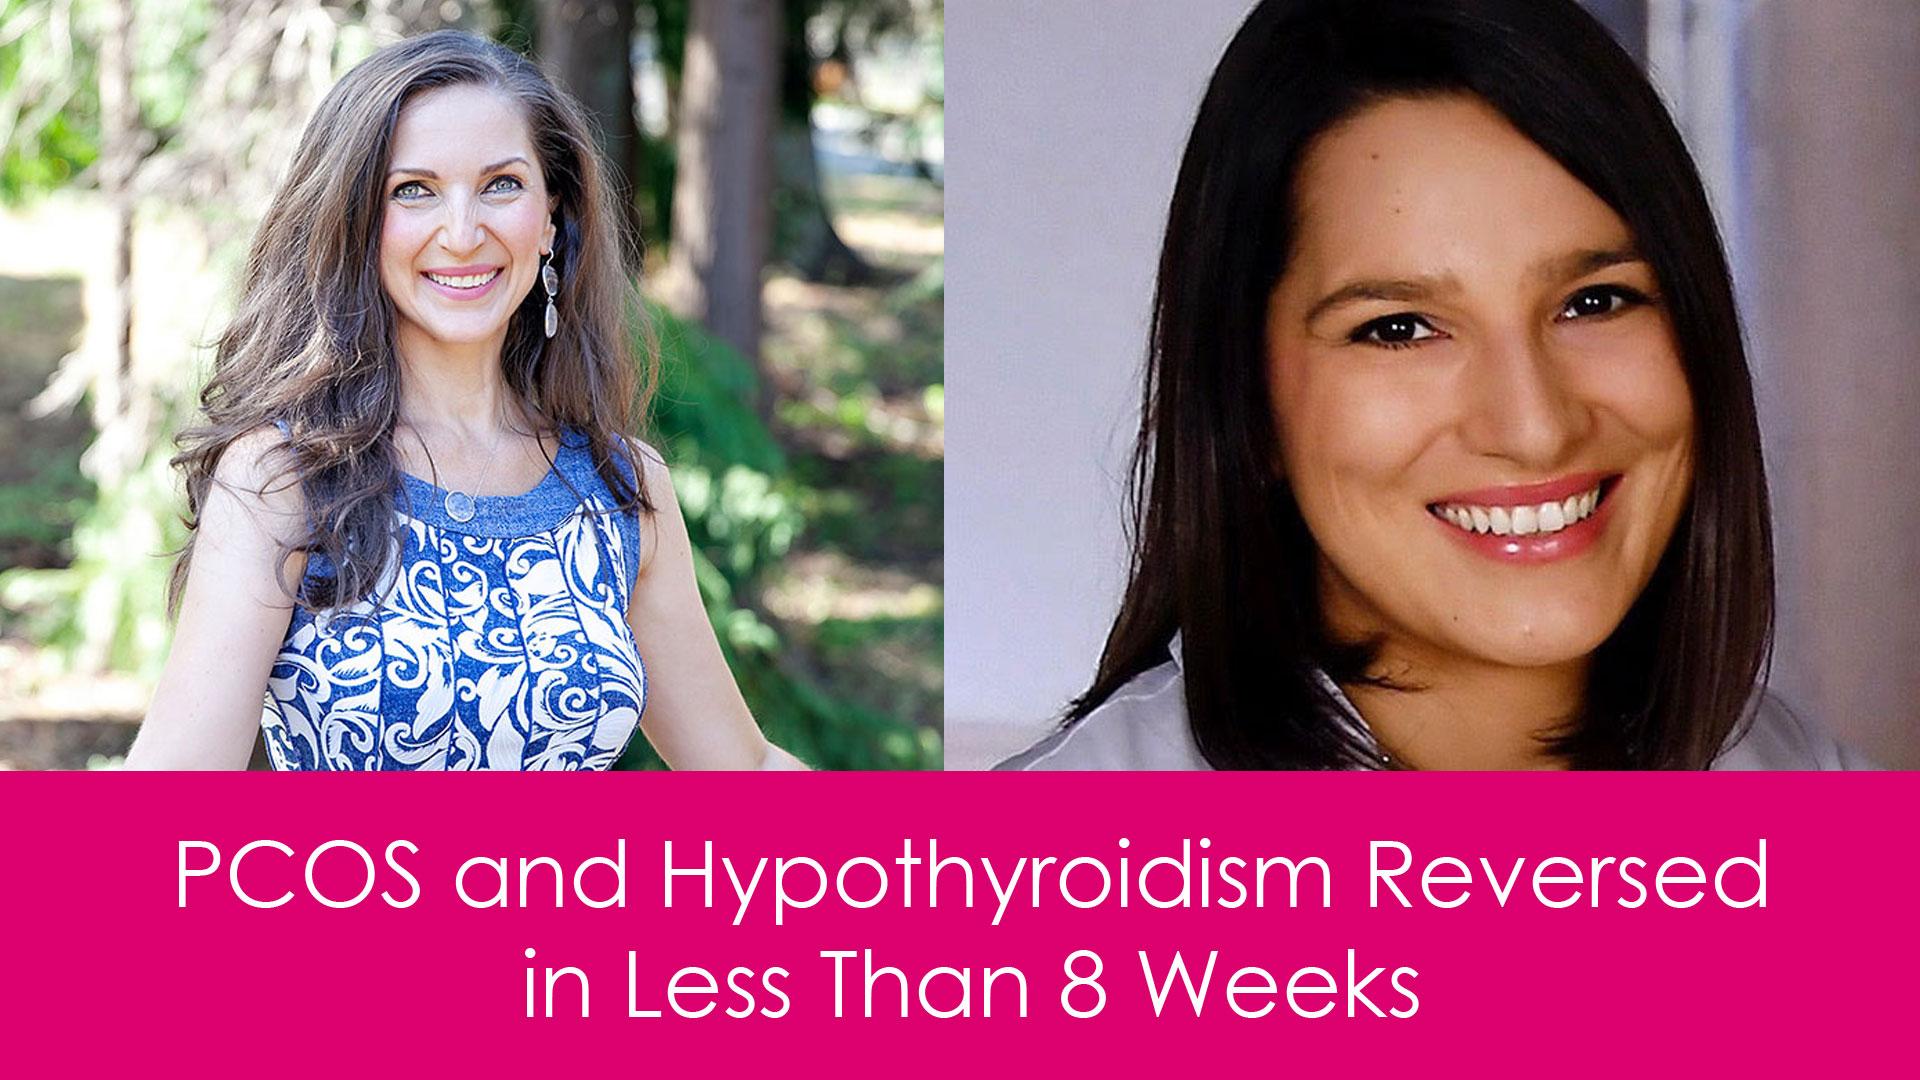 PCOS, hypothyroidism